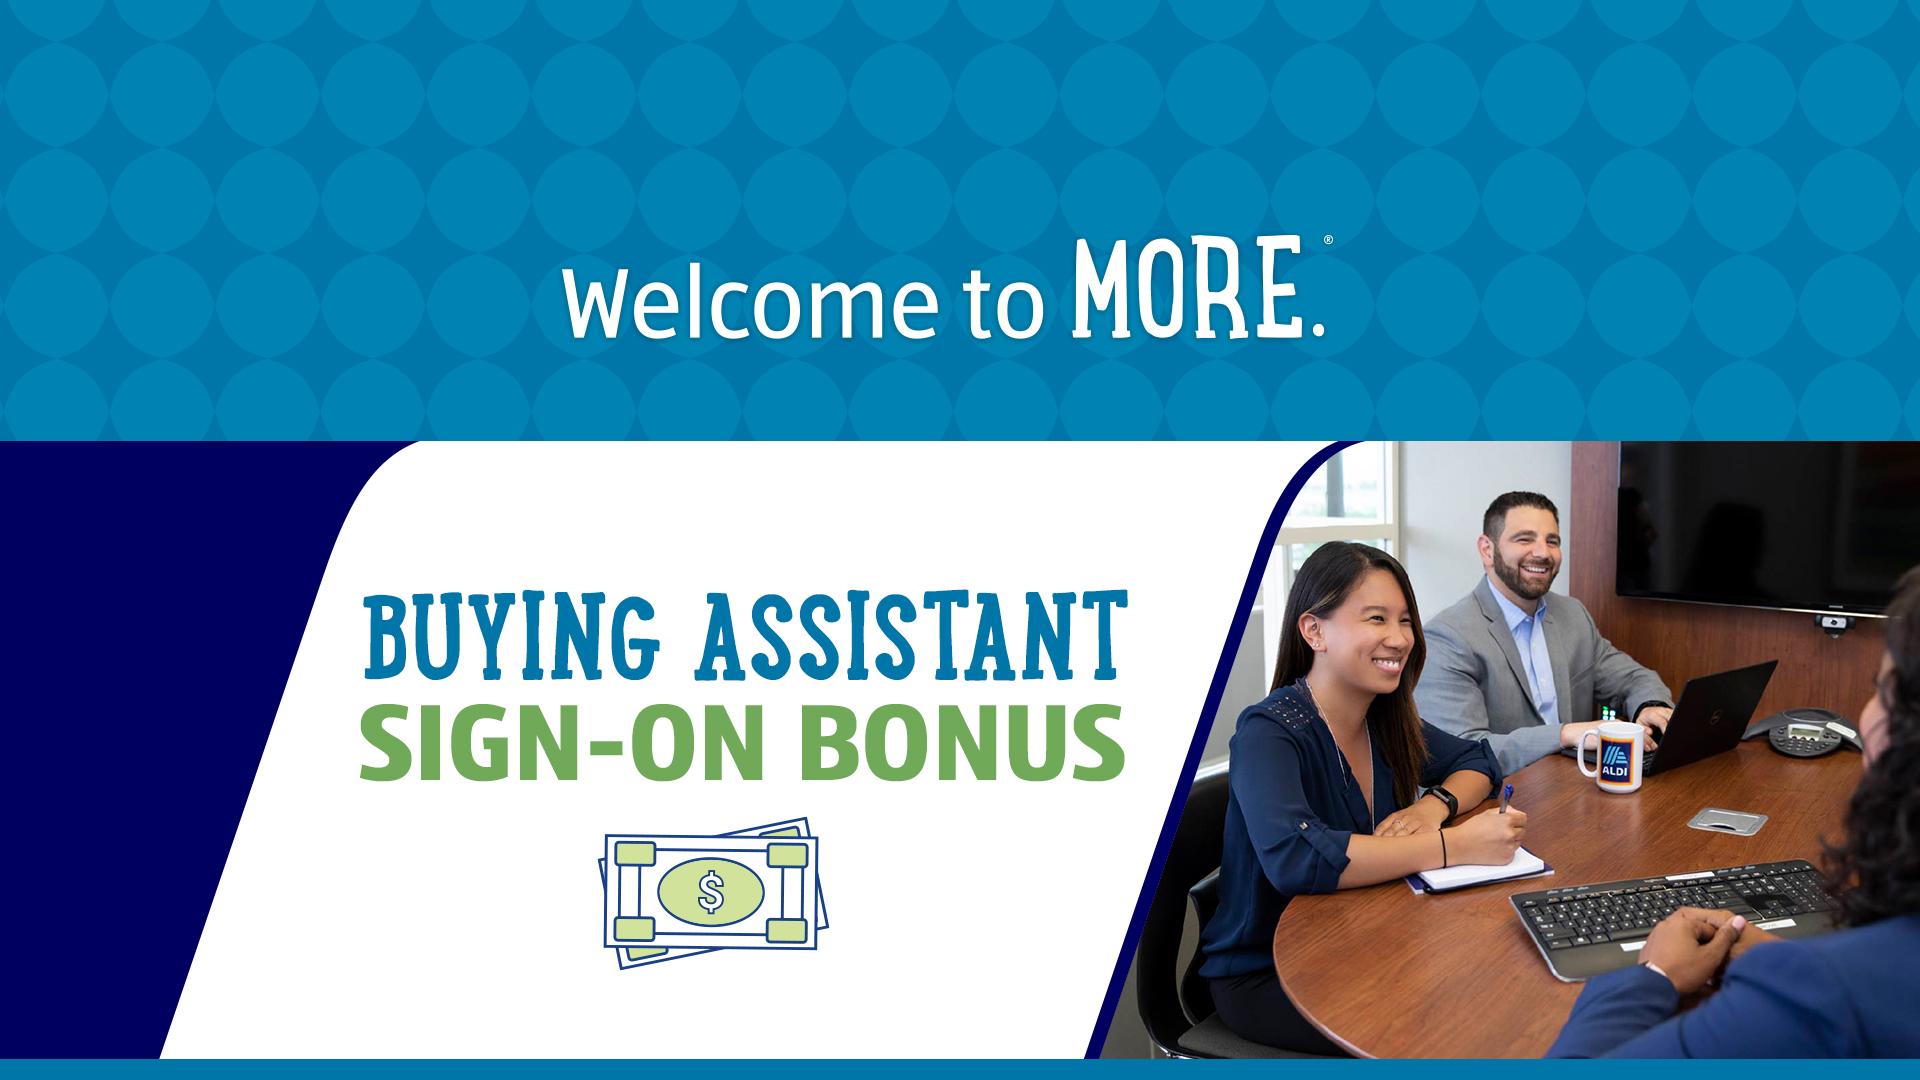 Buying Assistant Sign-On Bonus